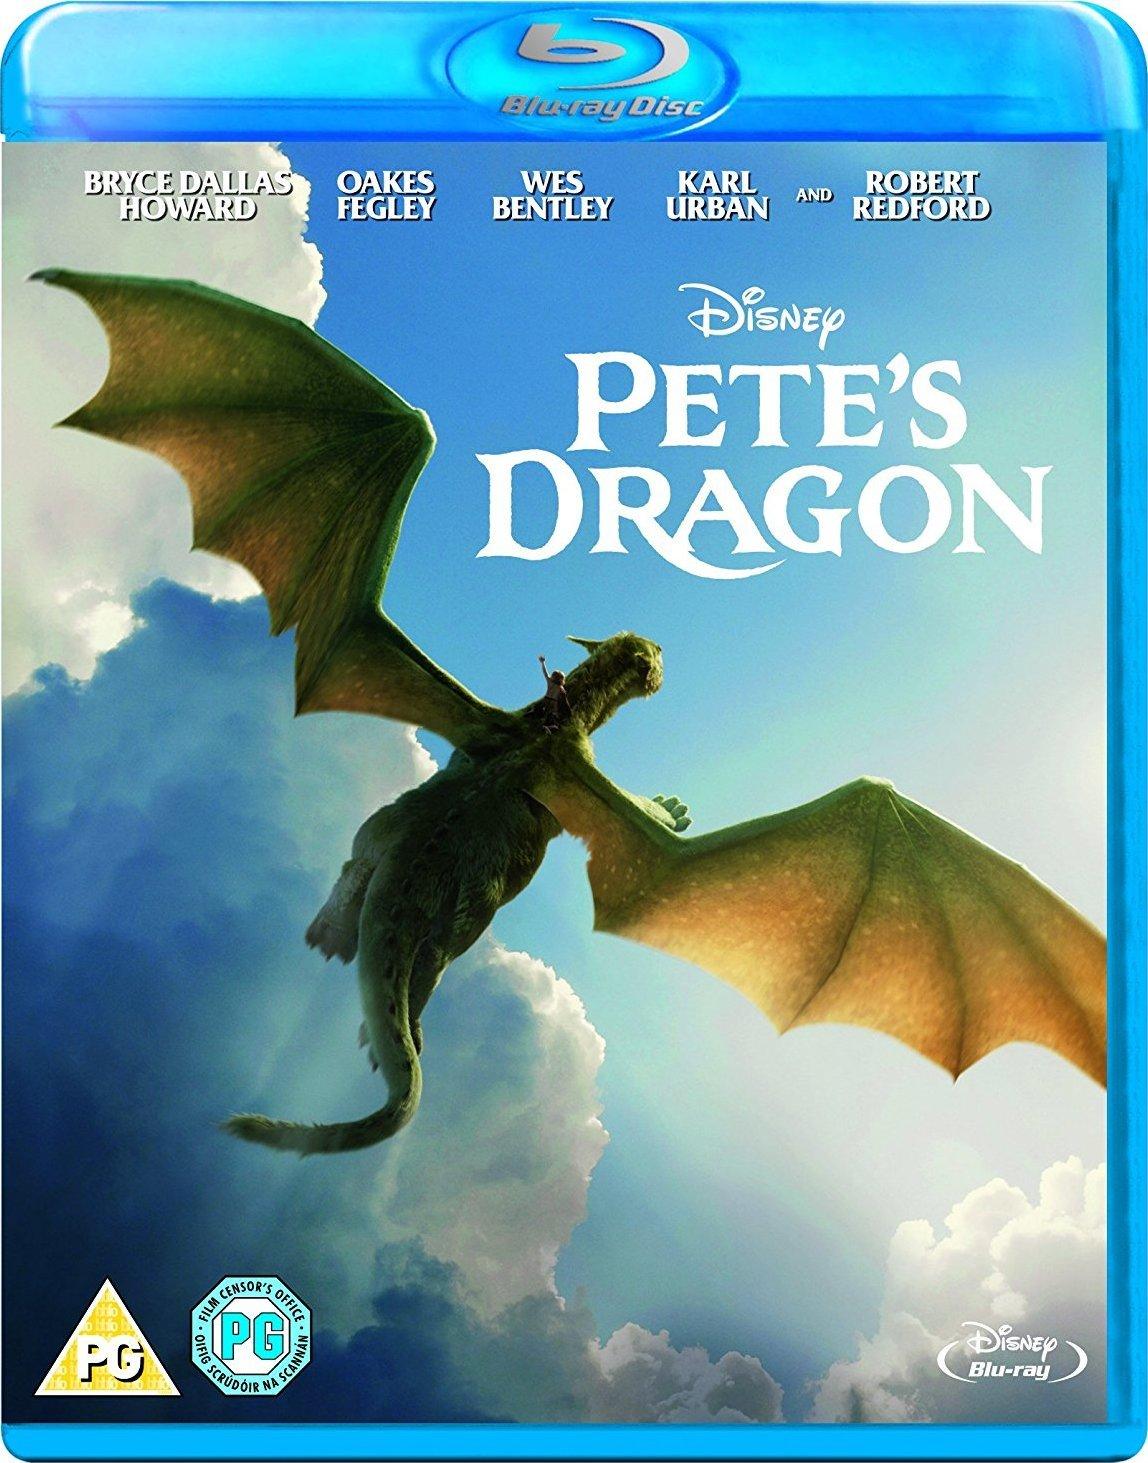 petes dragon full movie english download